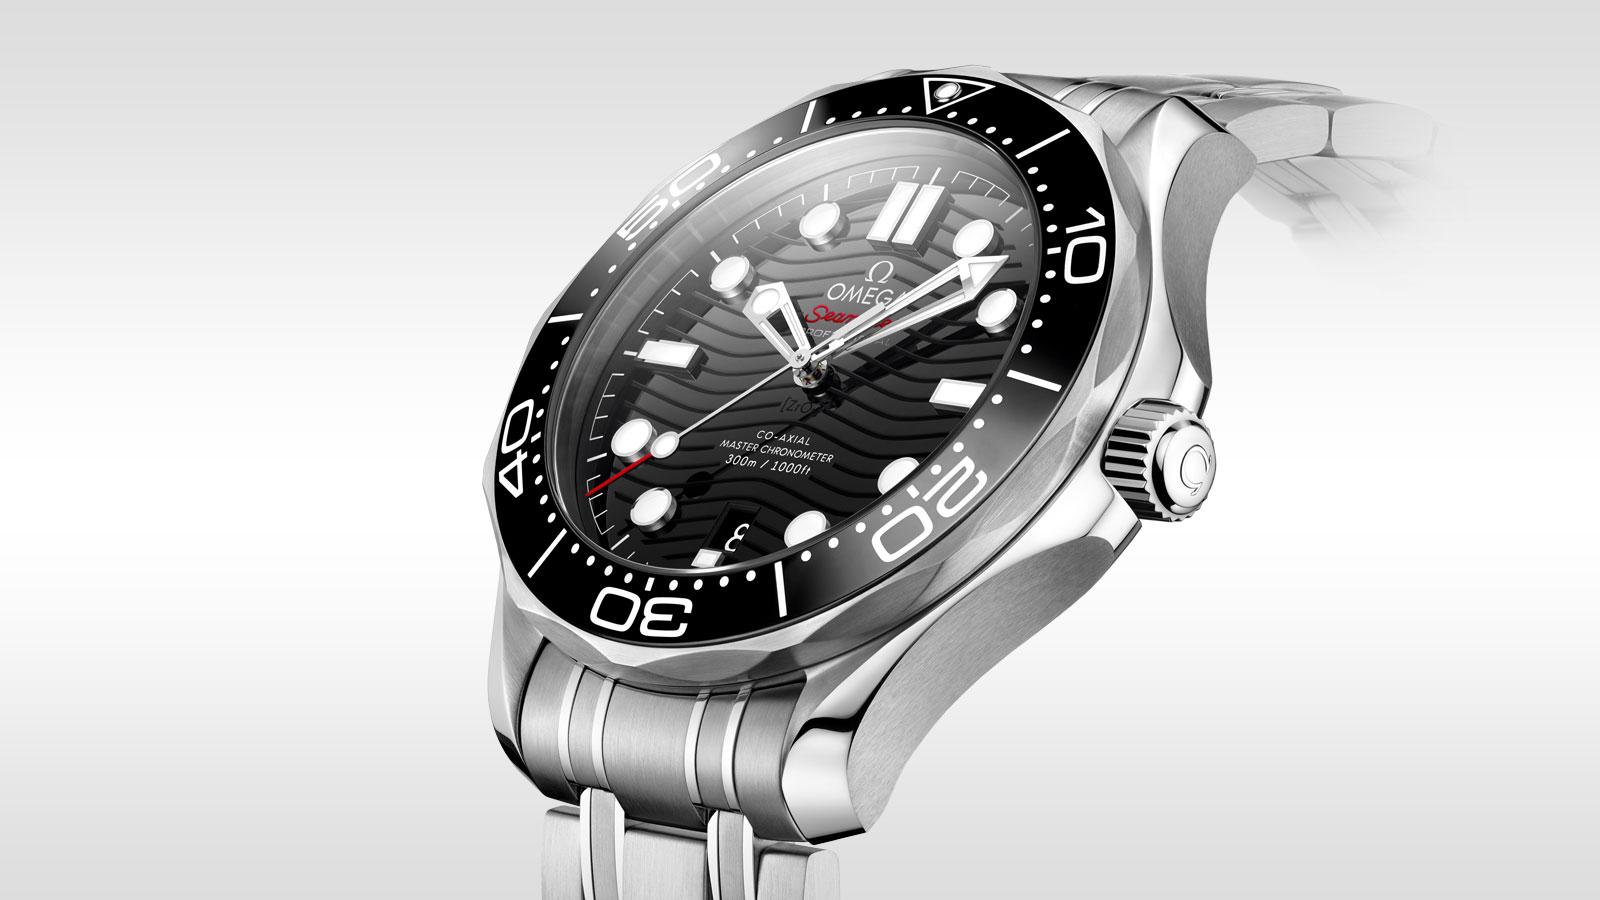 Seamaster 300米潜水表 300米潜水表 欧米茄同轴•至臻天文台表42毫米 - 210.30.42.20.01.001 - 查看 2